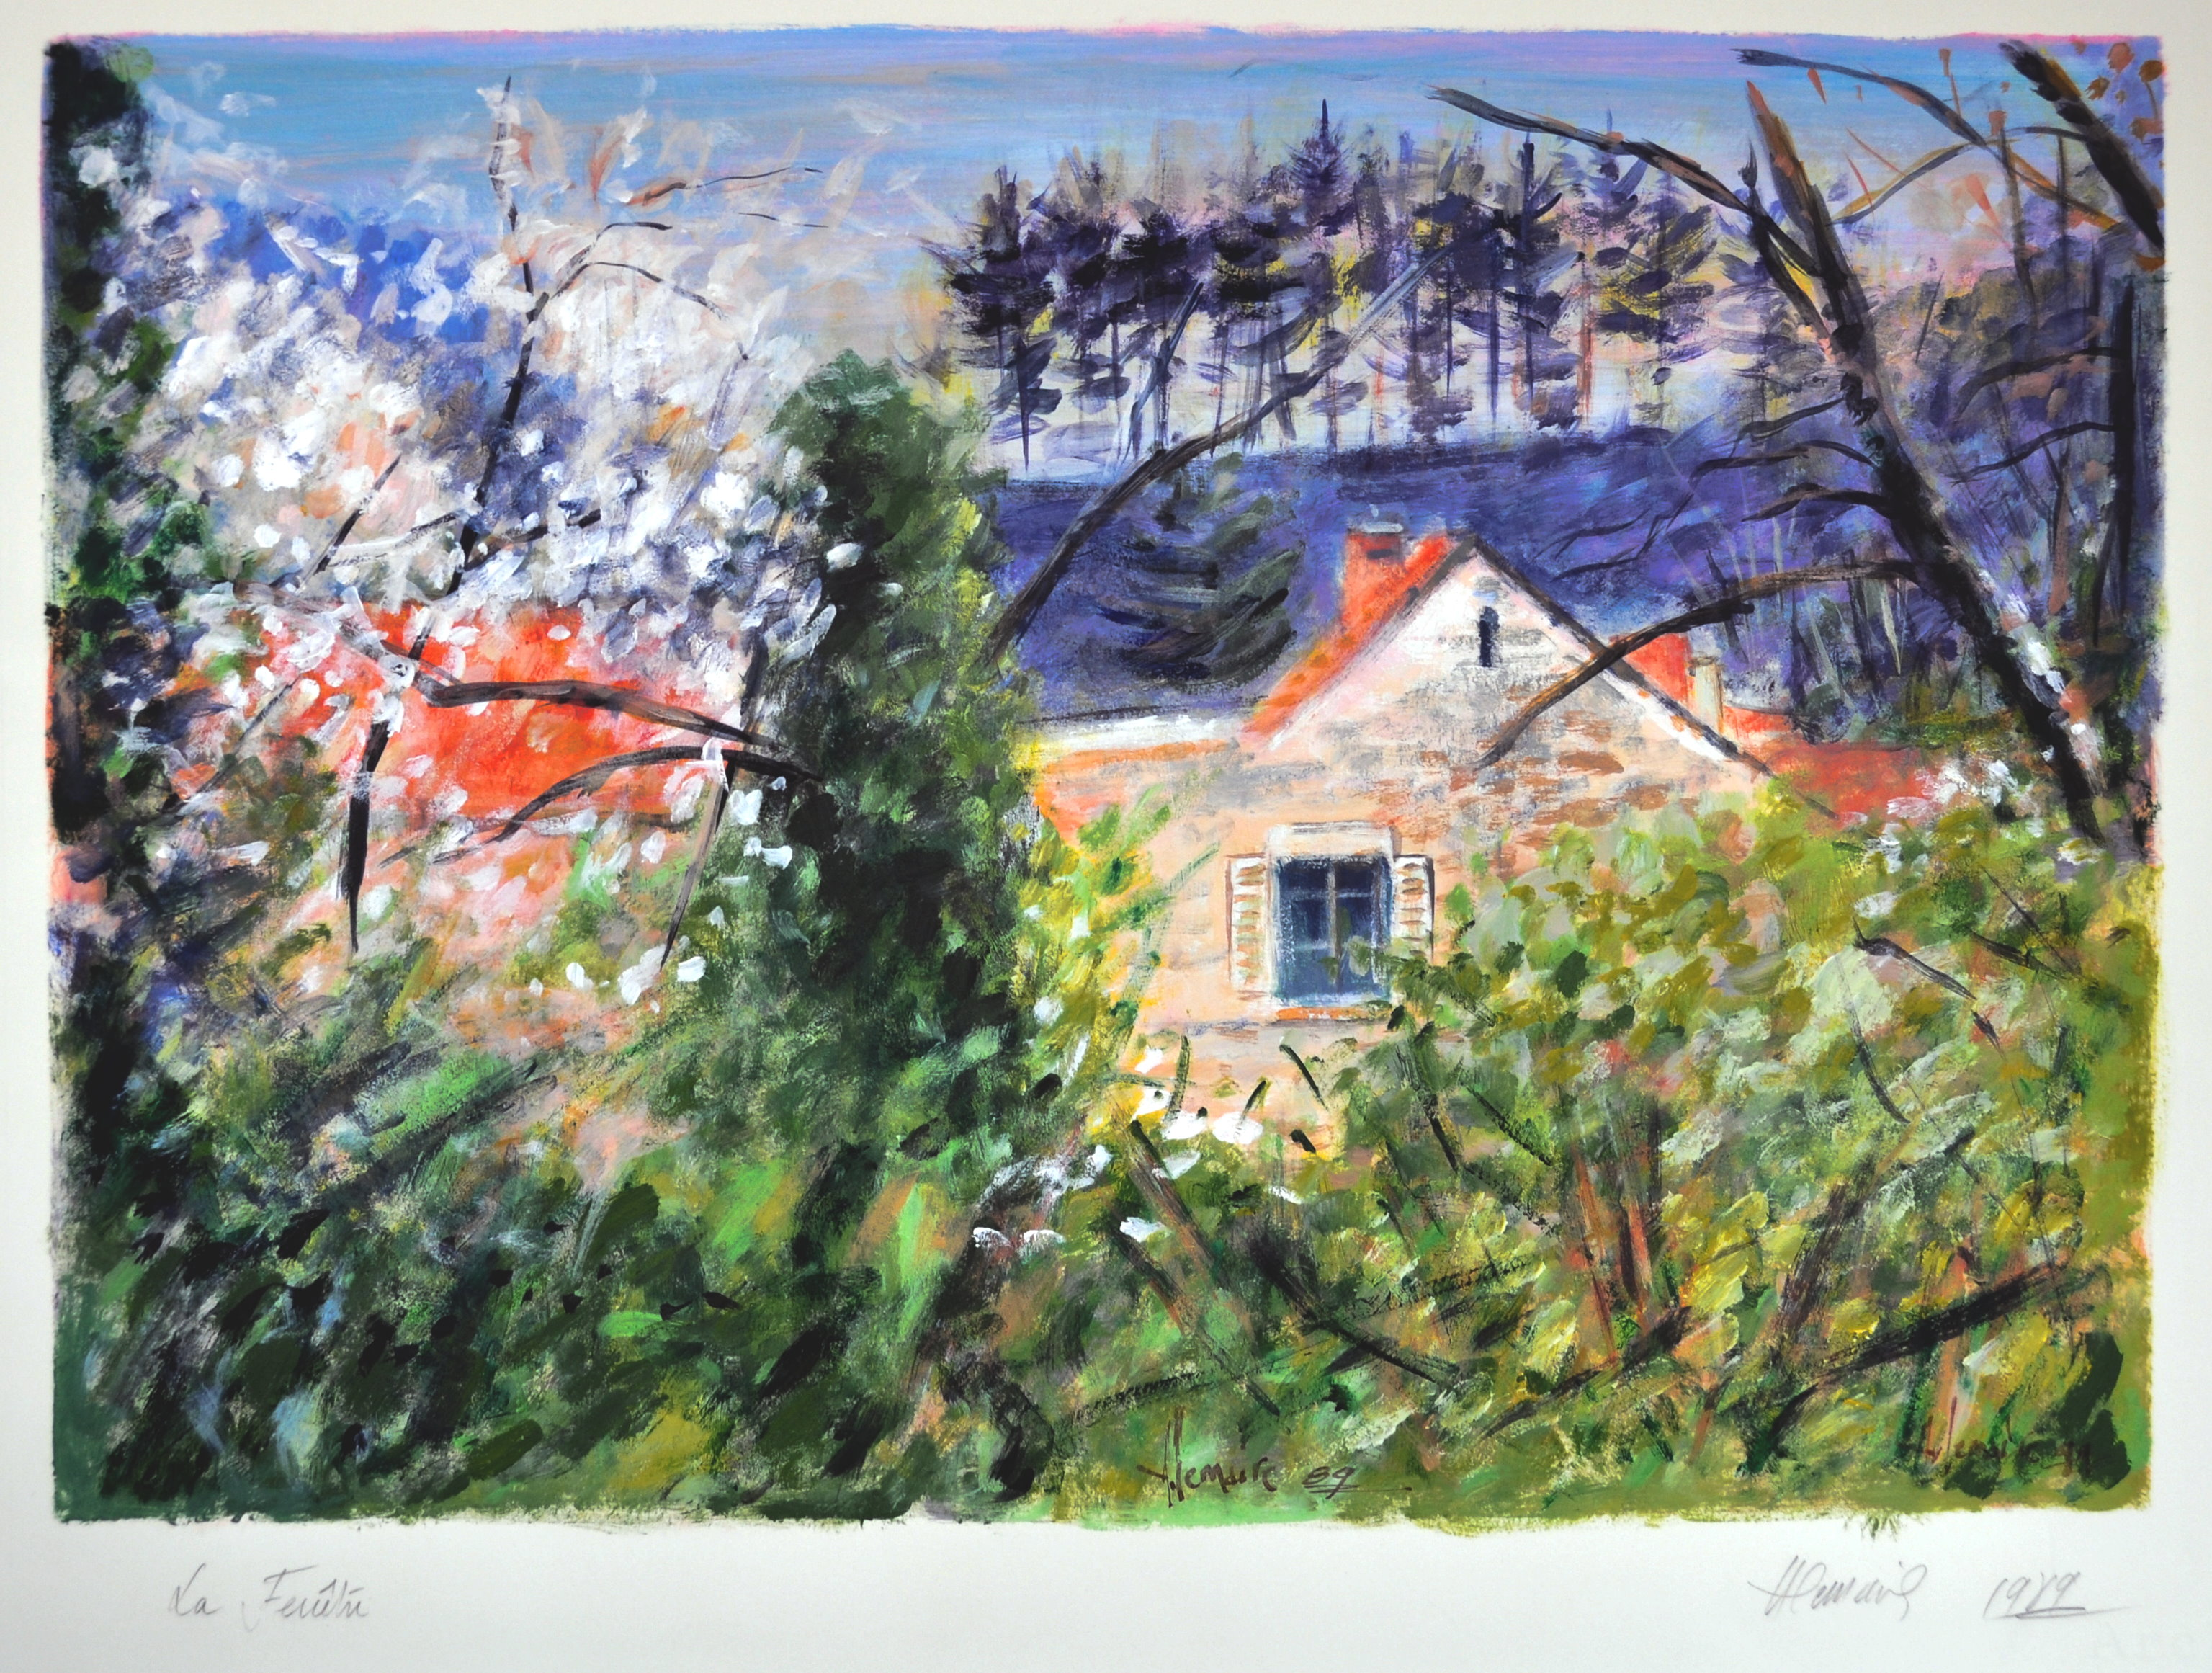 La fenêtre, cerisier en fleurs